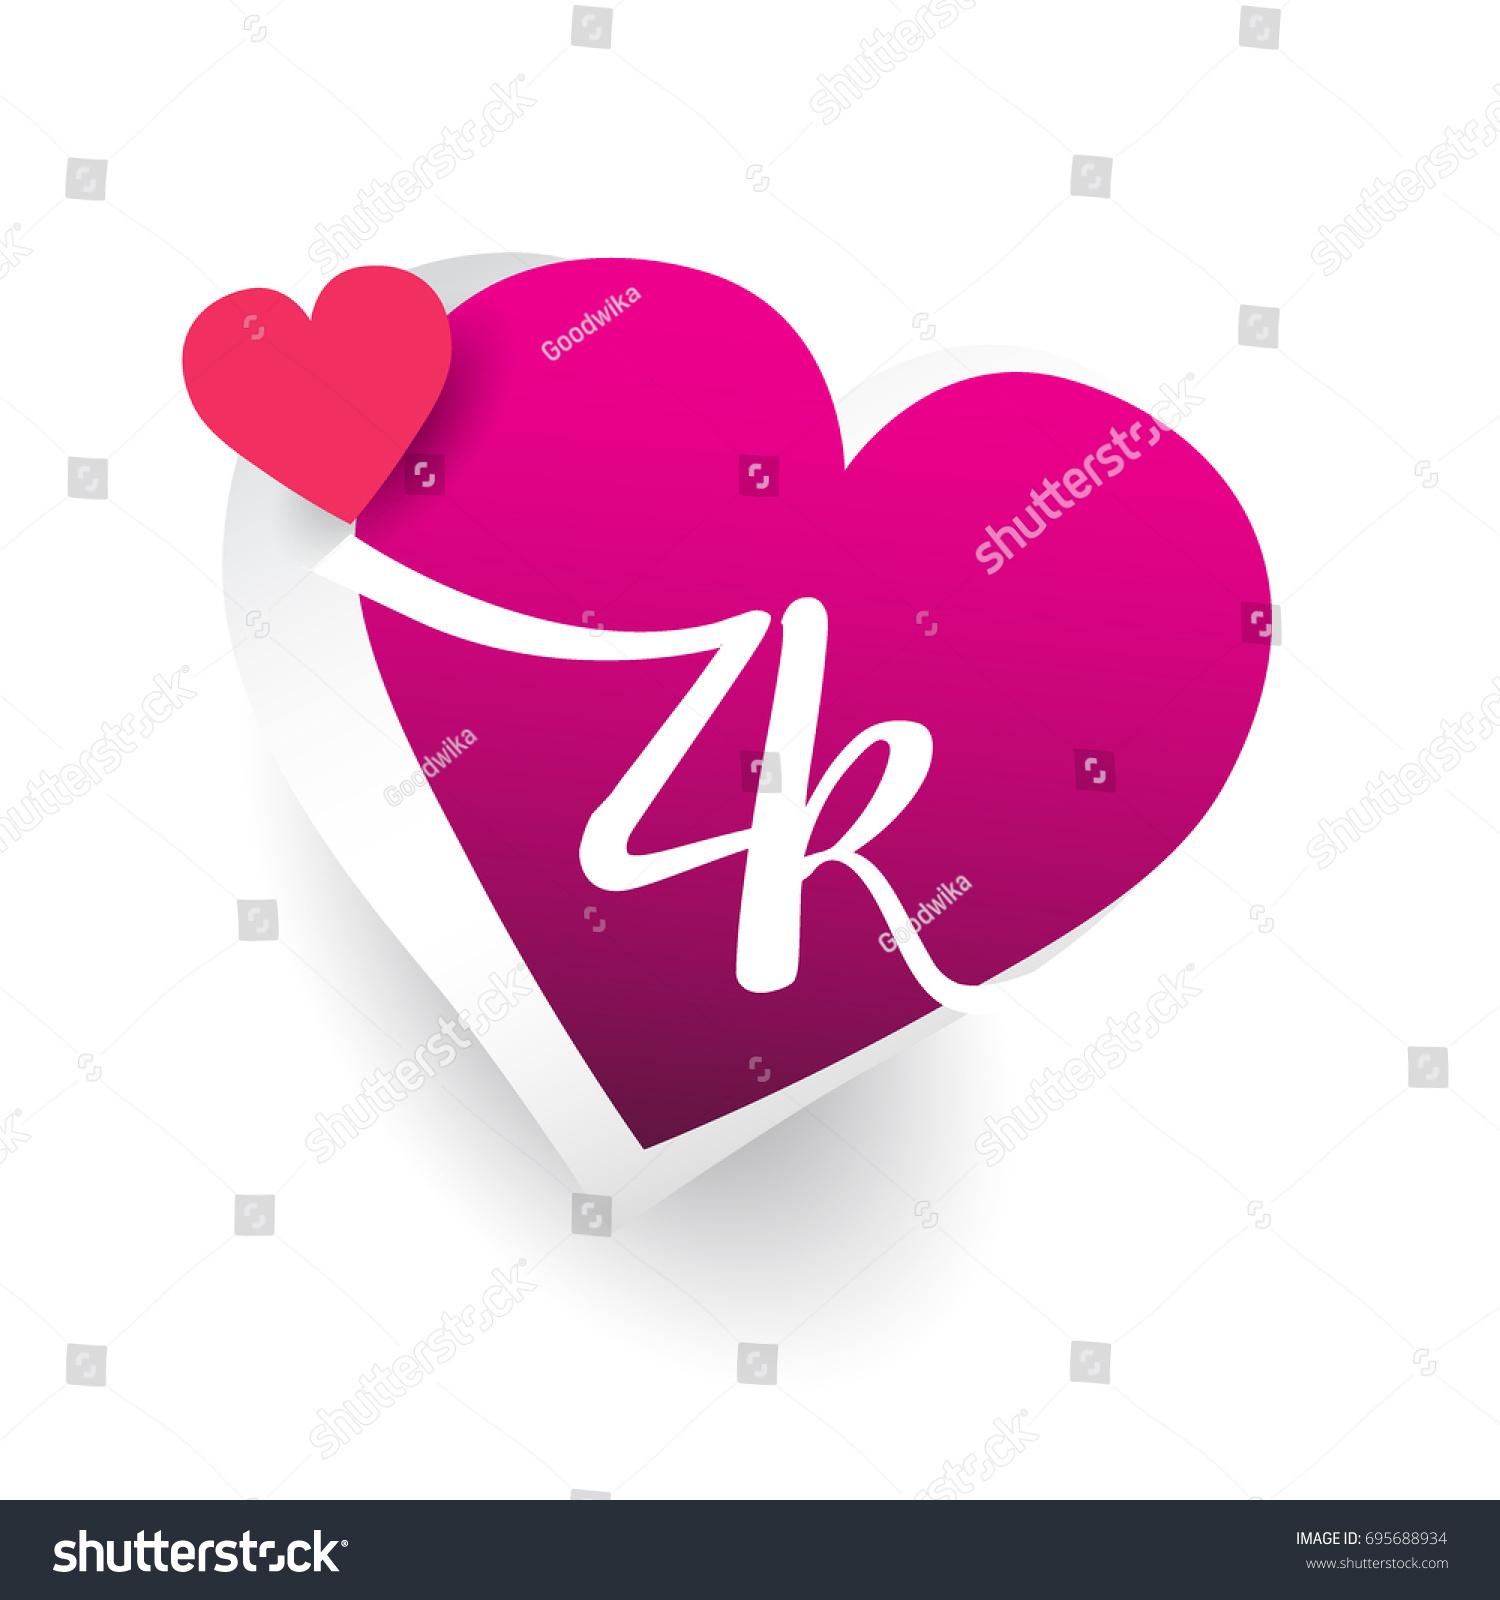 Initial Logo Letter Zk Heart Shape Stock Vector Royalty Free